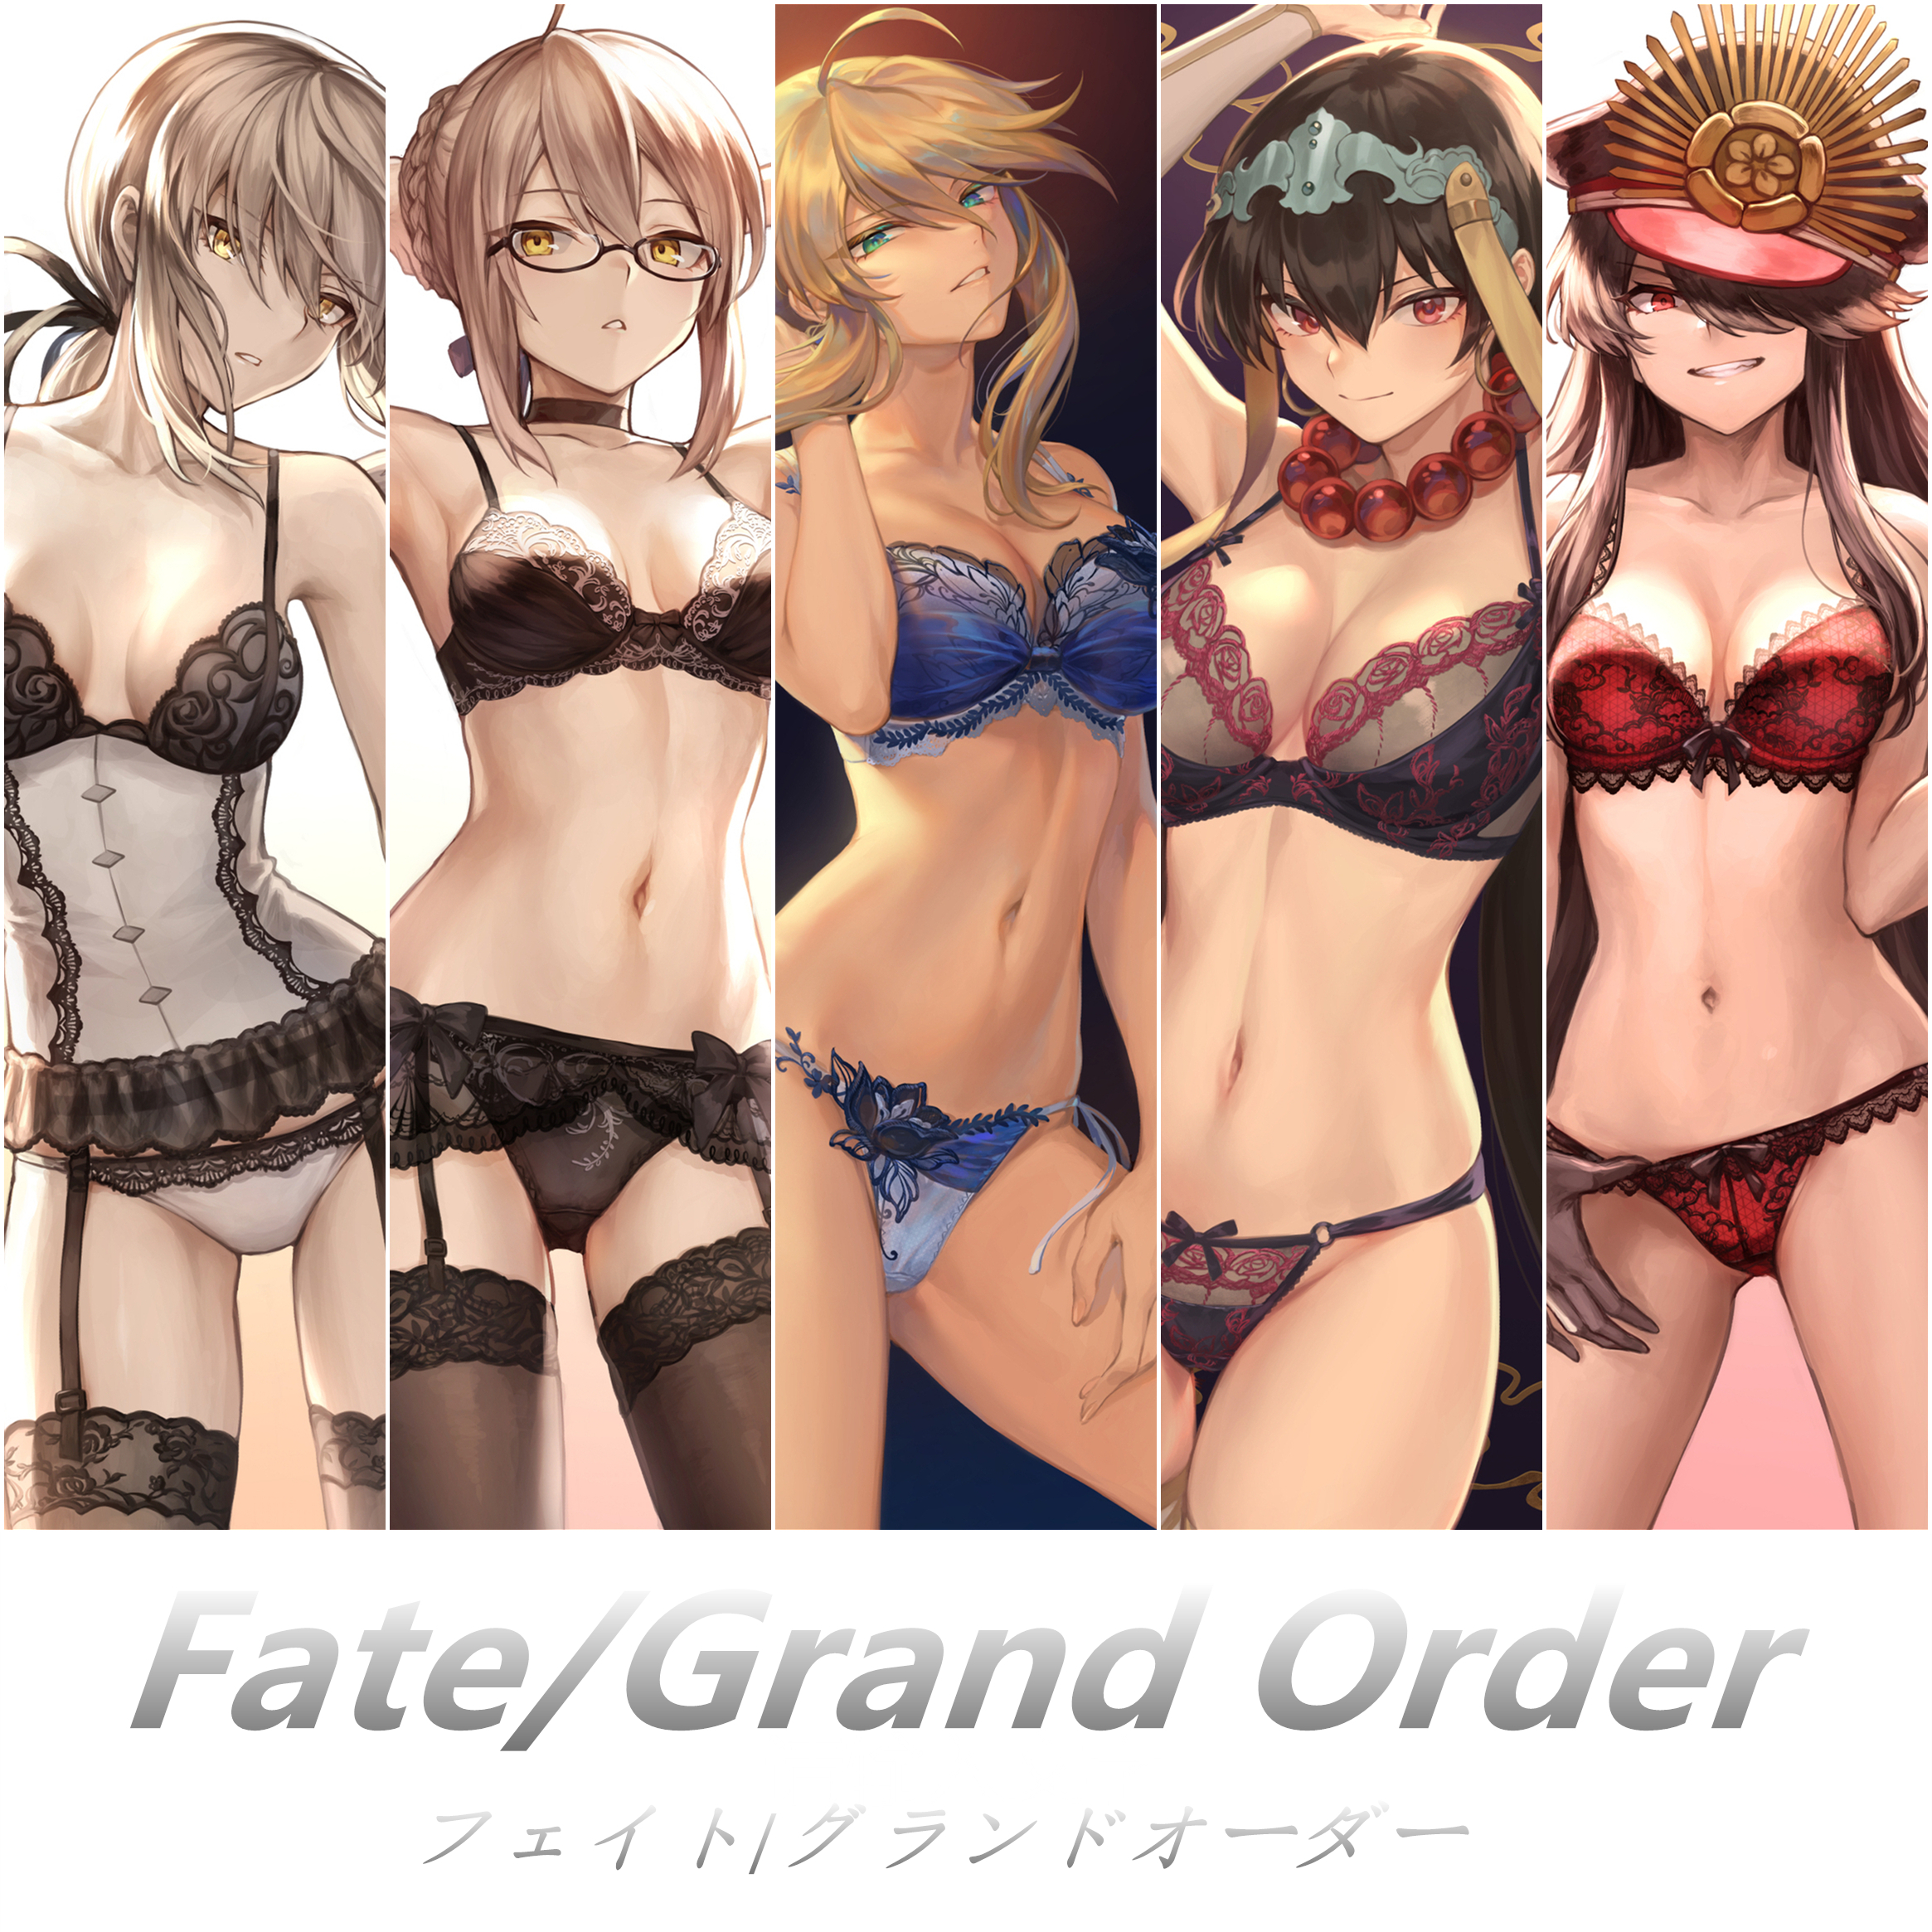 Cameltoe Ass 40x60cm fate grand order fate/go fgo sexy loli ass bra